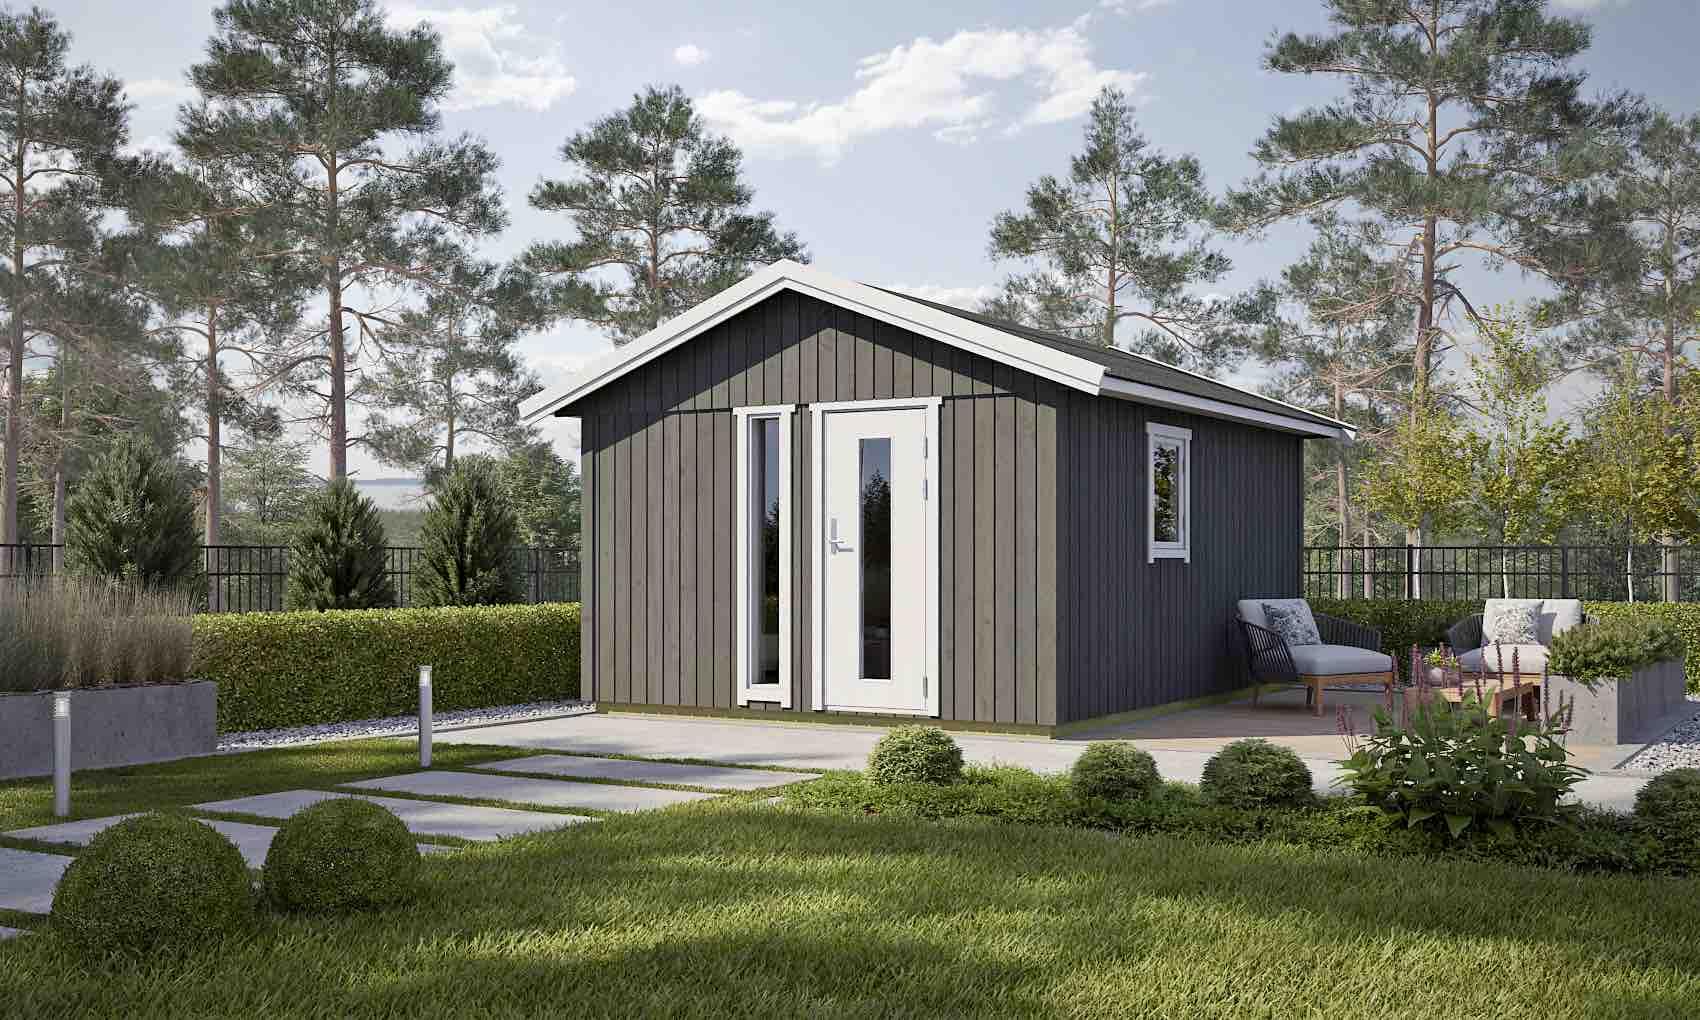 gartenhaus nordic plus 15 122 mm ca 355x451 cm holzwurm obersayn. Black Bedroom Furniture Sets. Home Design Ideas